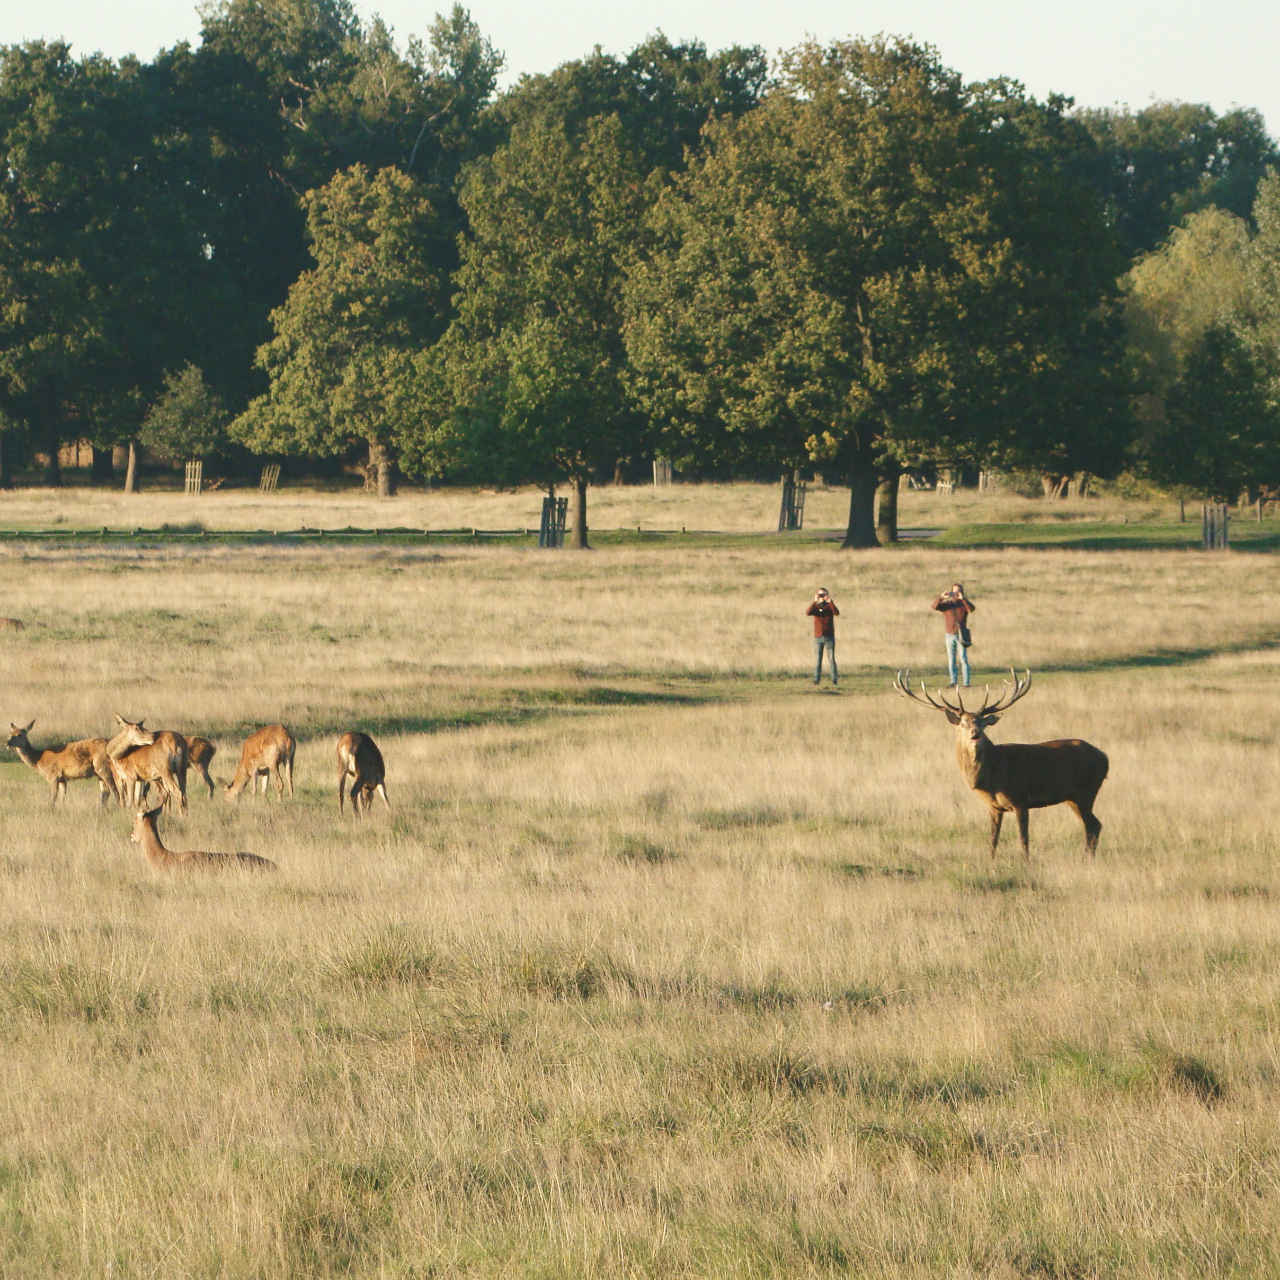 Red deer in Richmond Park, London, 30 September 2015